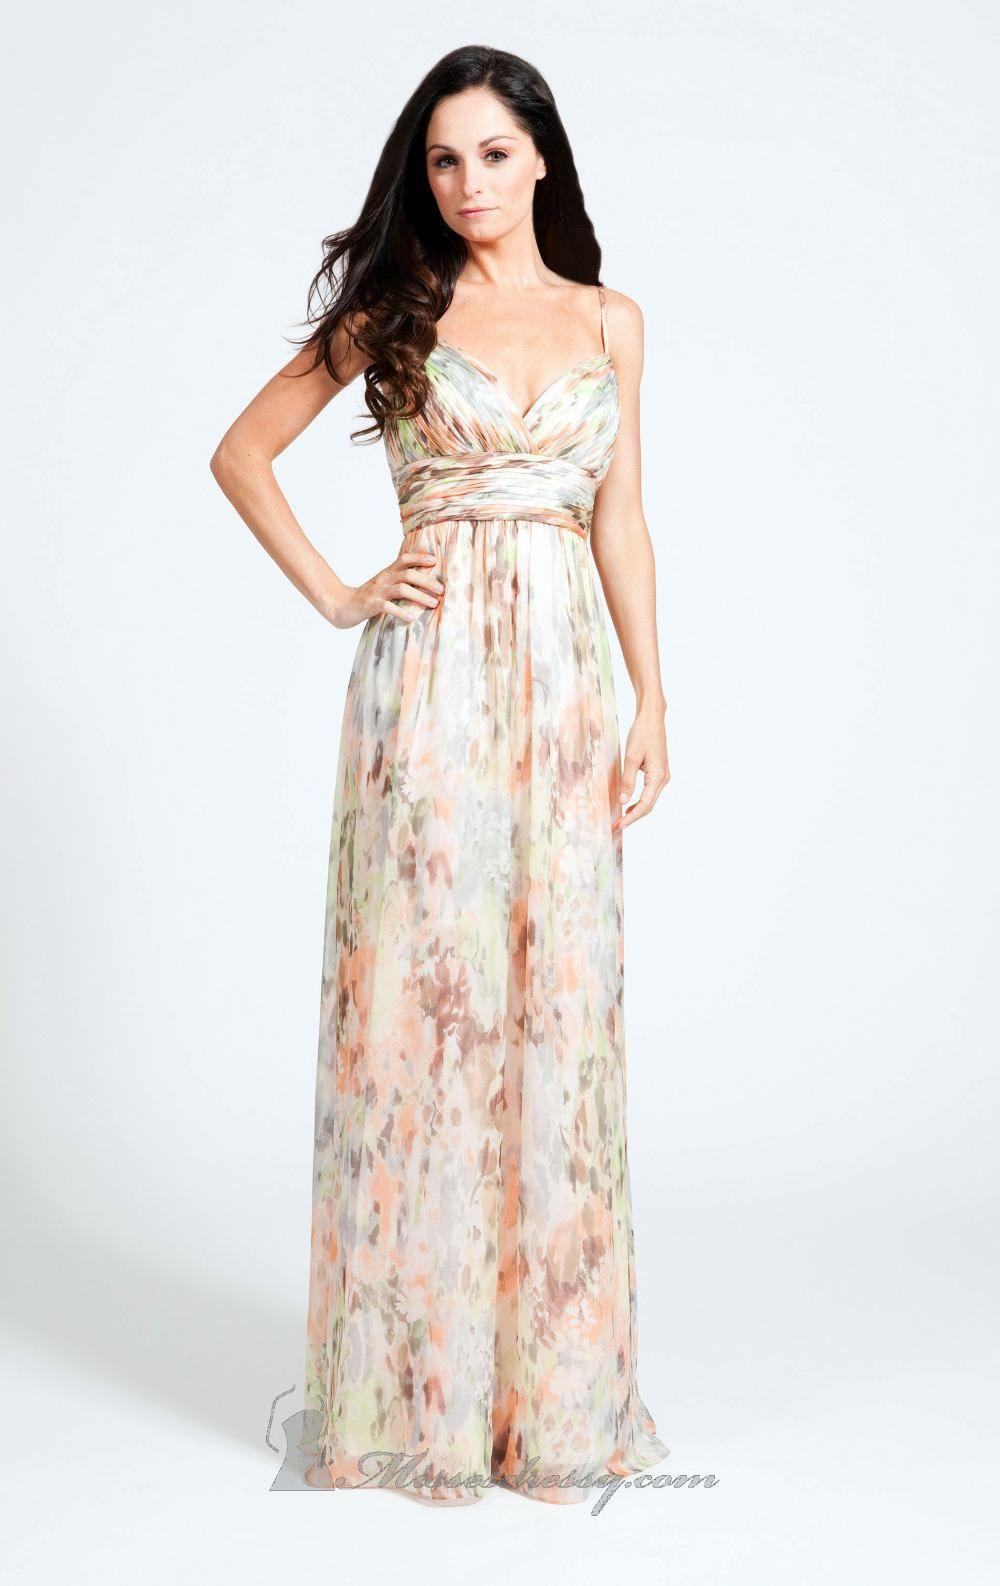 Guest of wedding dresses summer  beautiful summer dress   My Style  Pinterest  Decoding